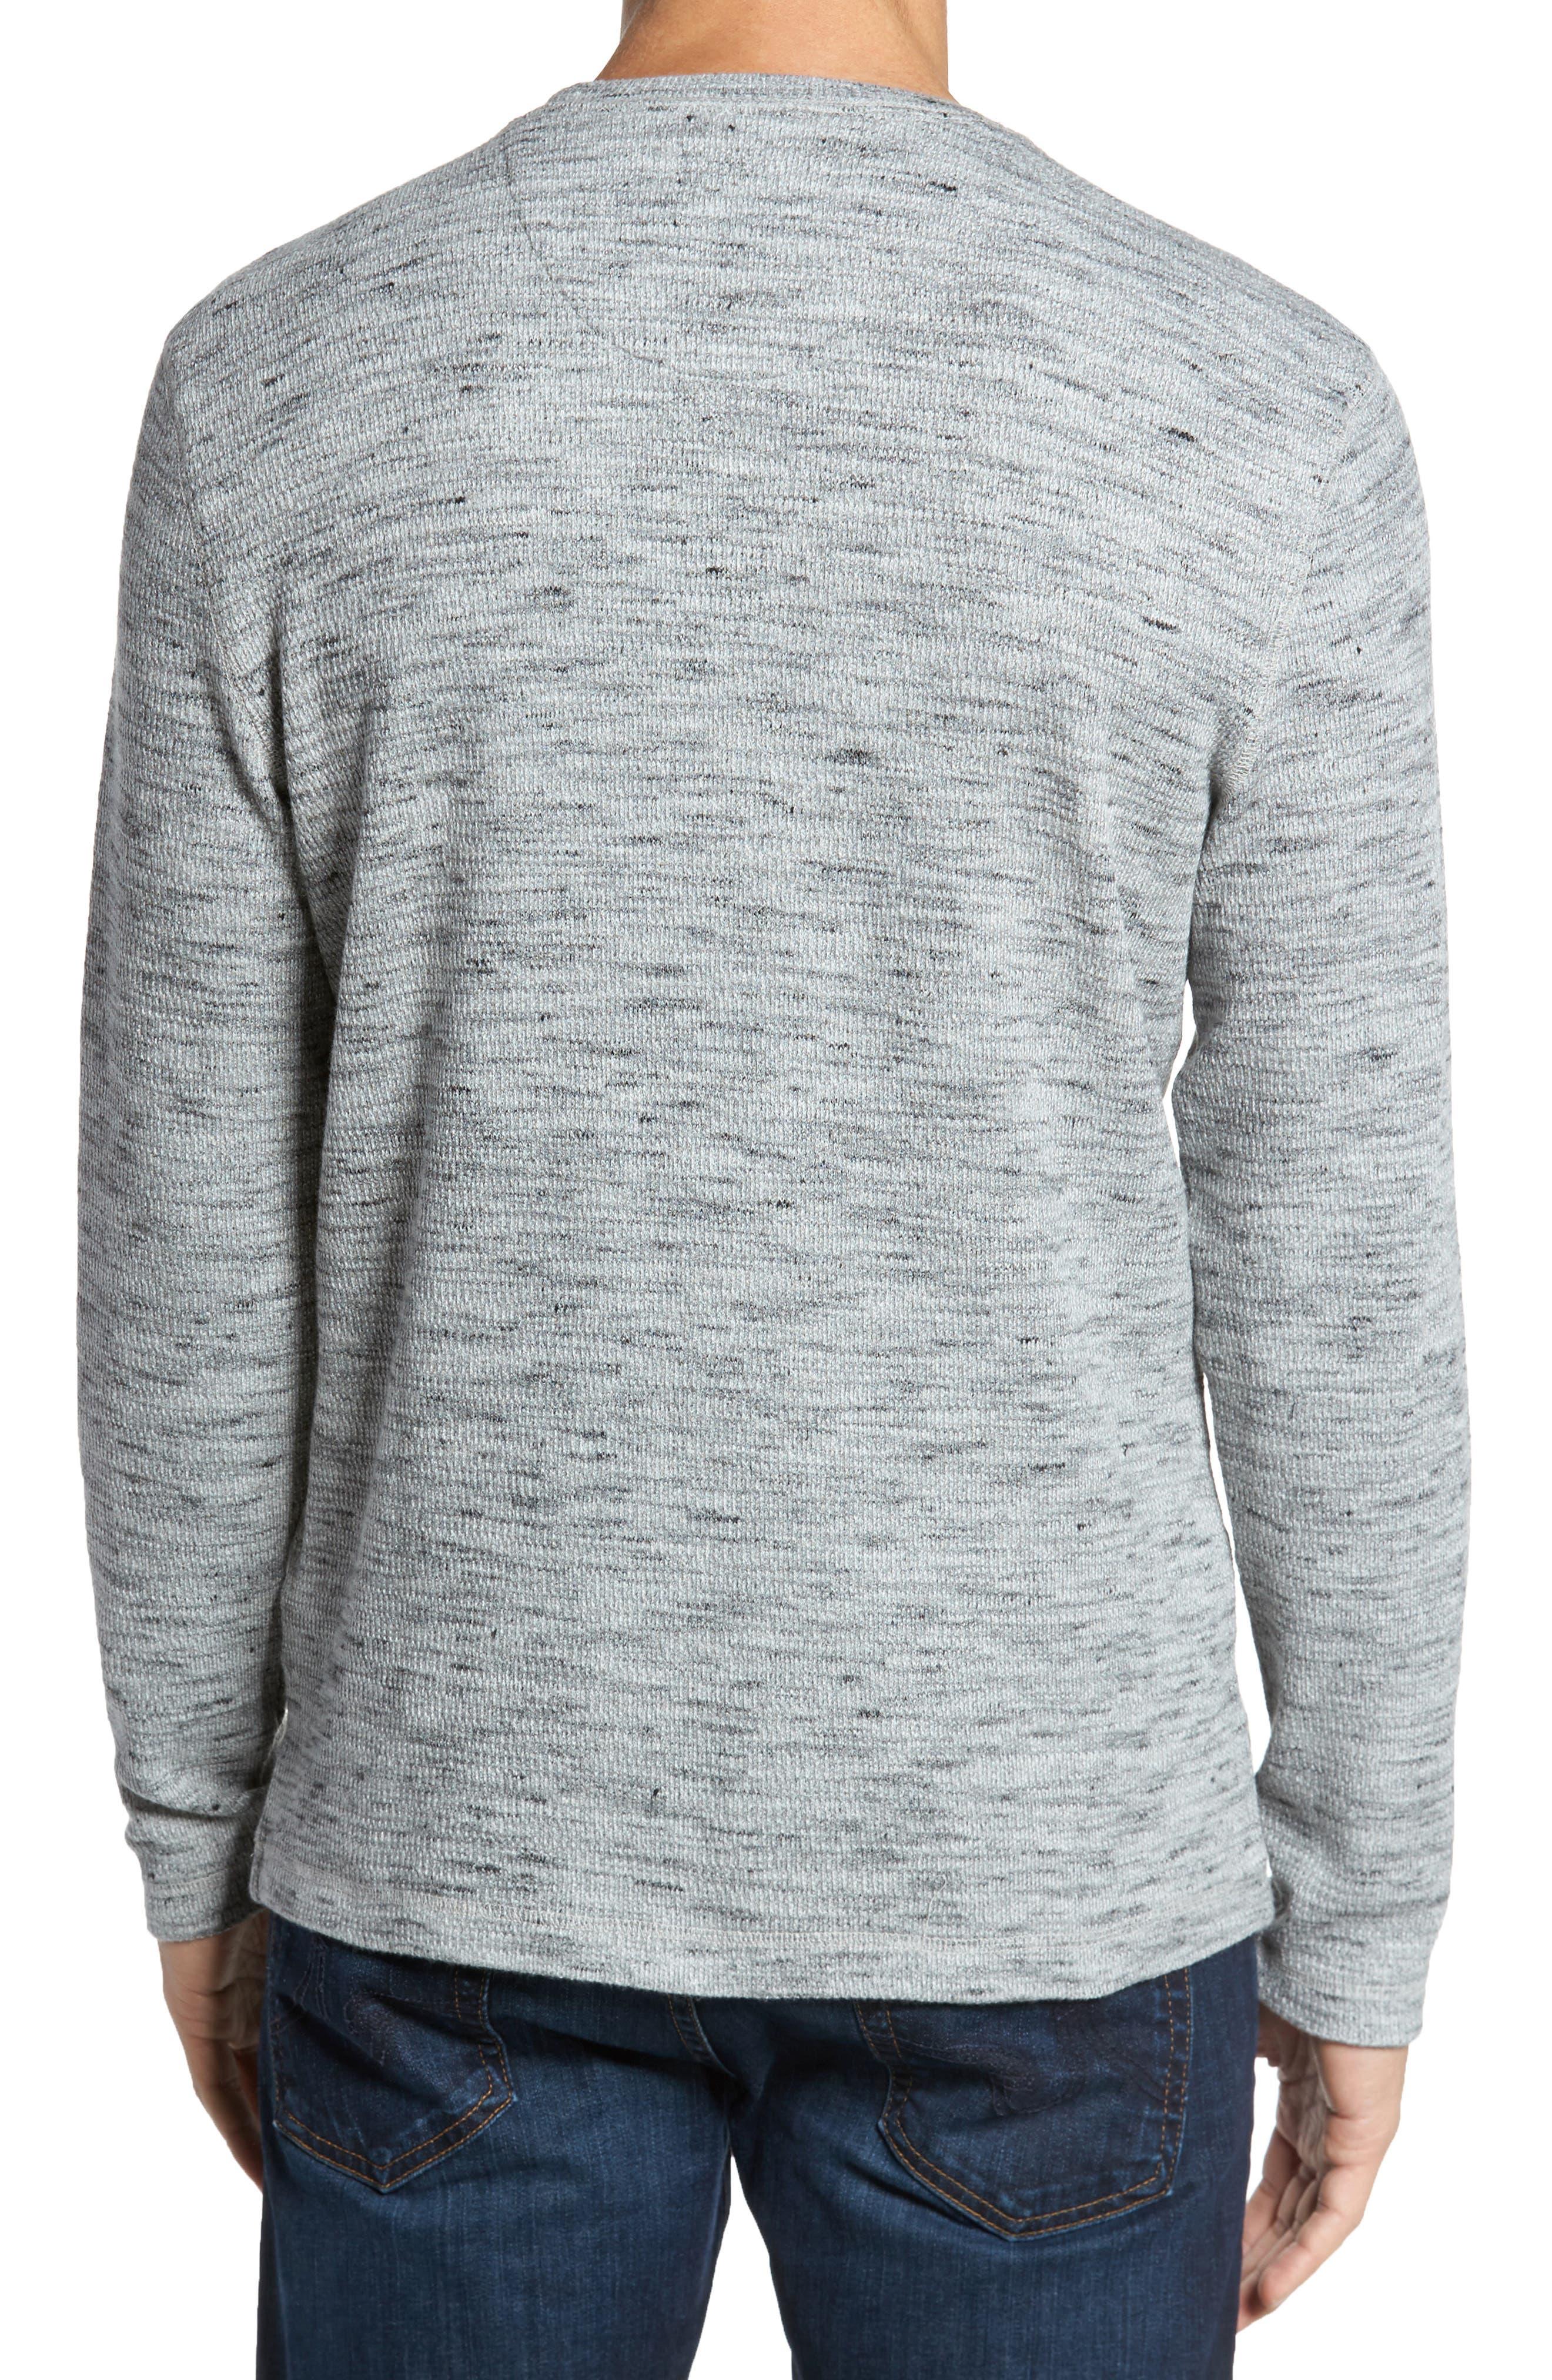 Waffle Knit Shirt,                             Alternate thumbnail 2, color,                             Grey Sleet Melange